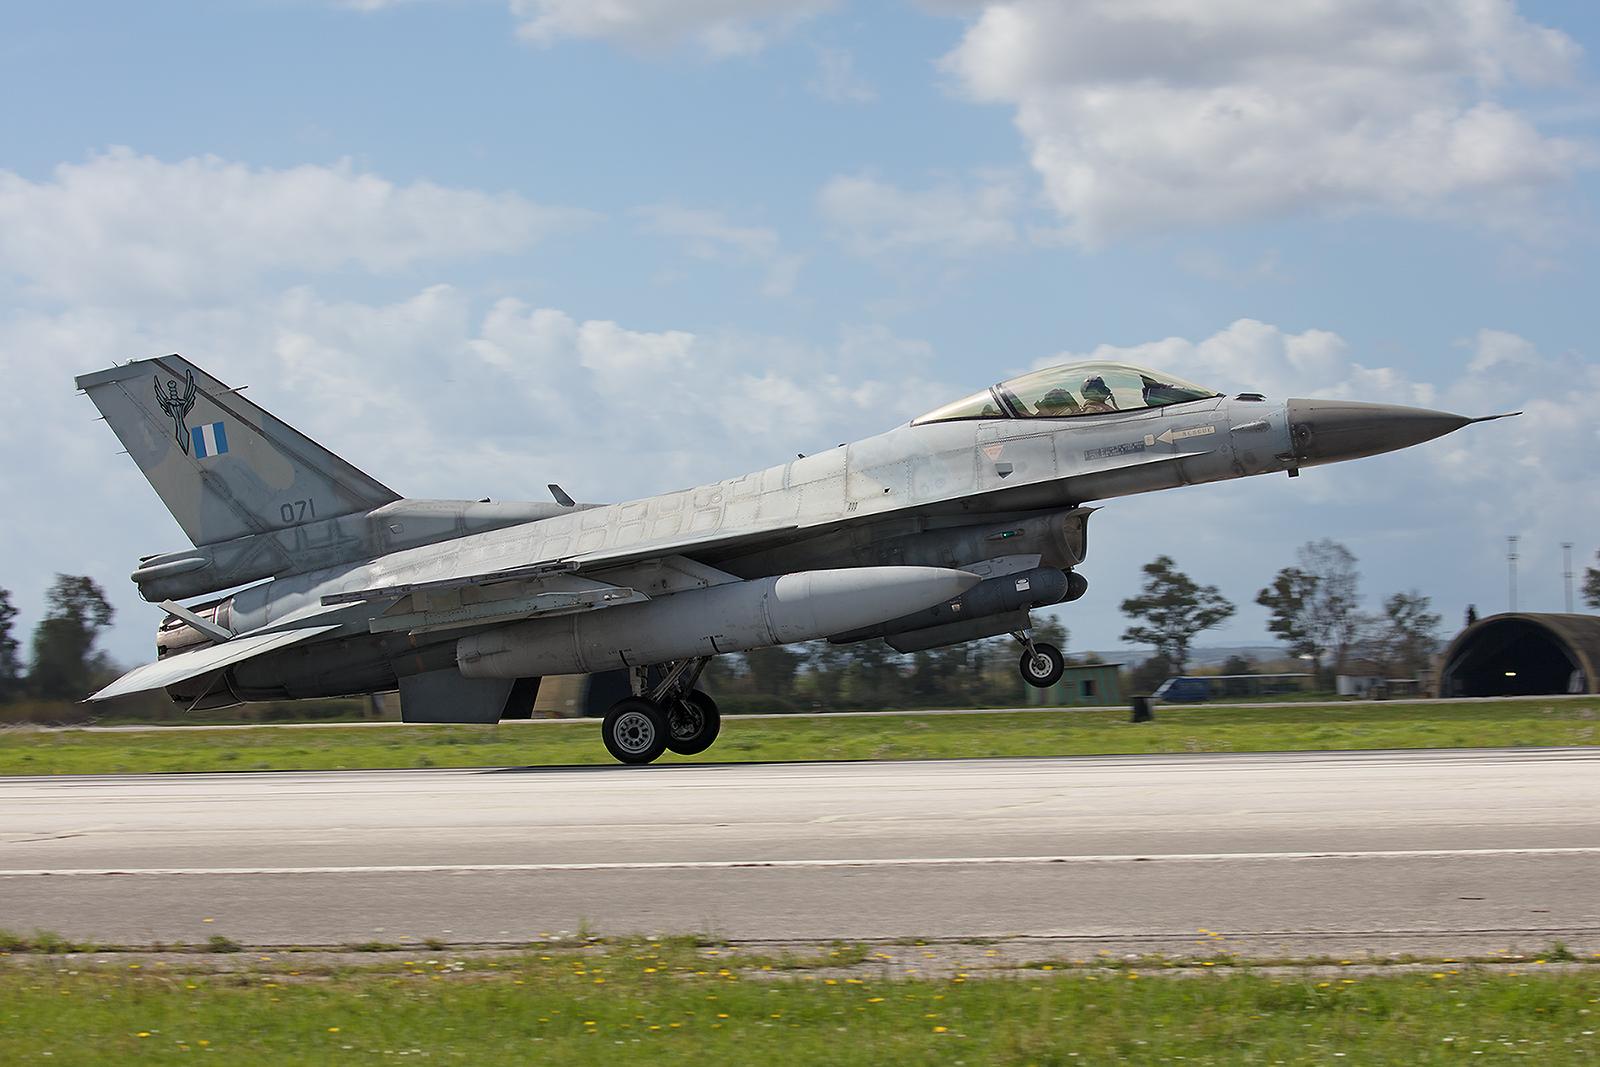 071, General Dynamics F-16C Block 50 der 347 Mira aus Nea Anghialos.